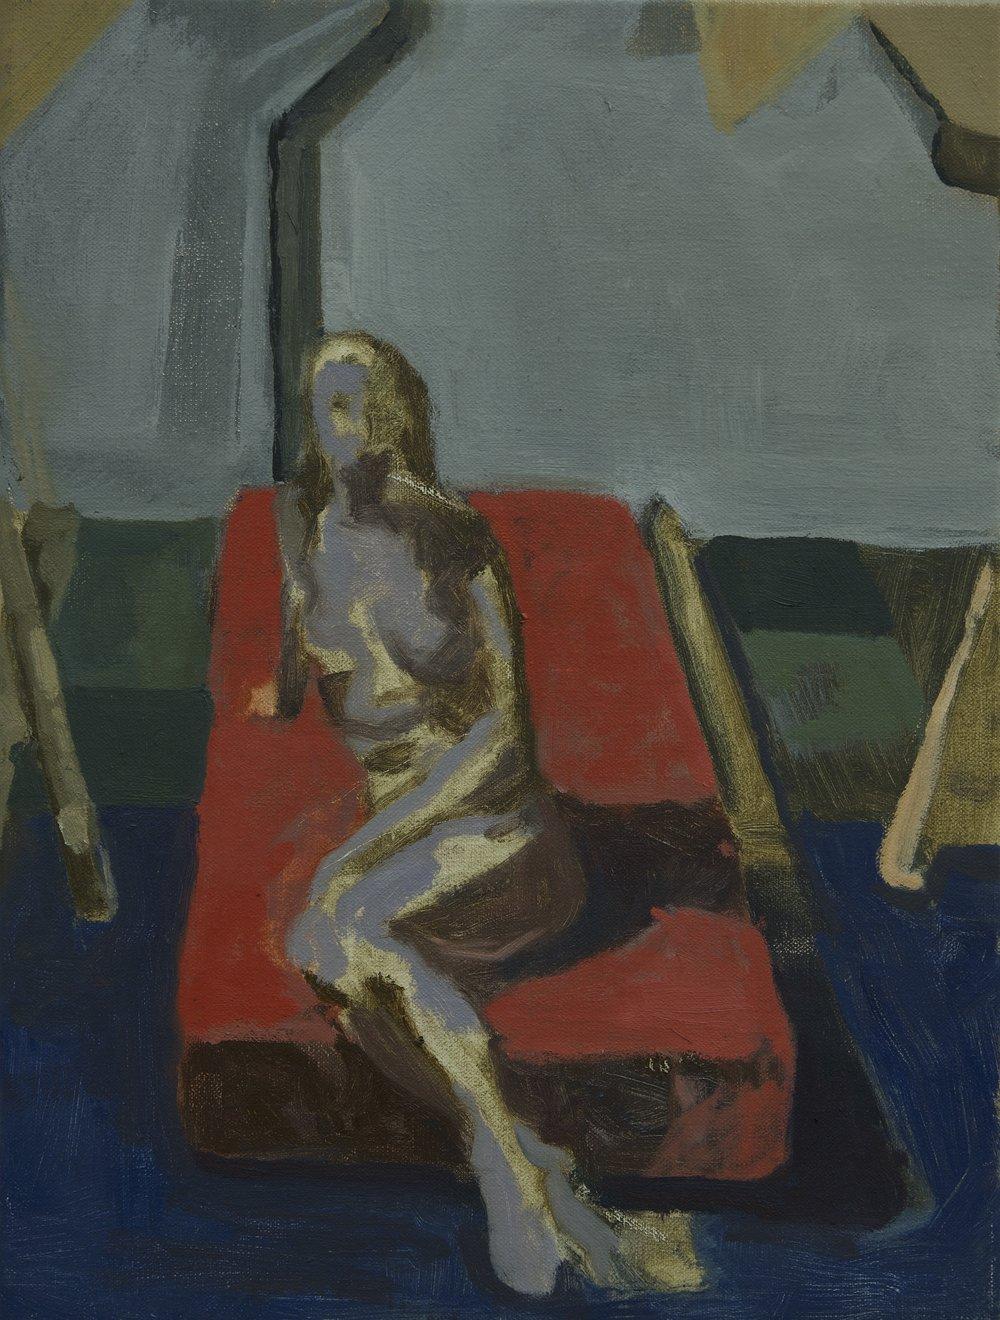 Martens (unfinished), 40 x 30 cm, oil on linen, 2018